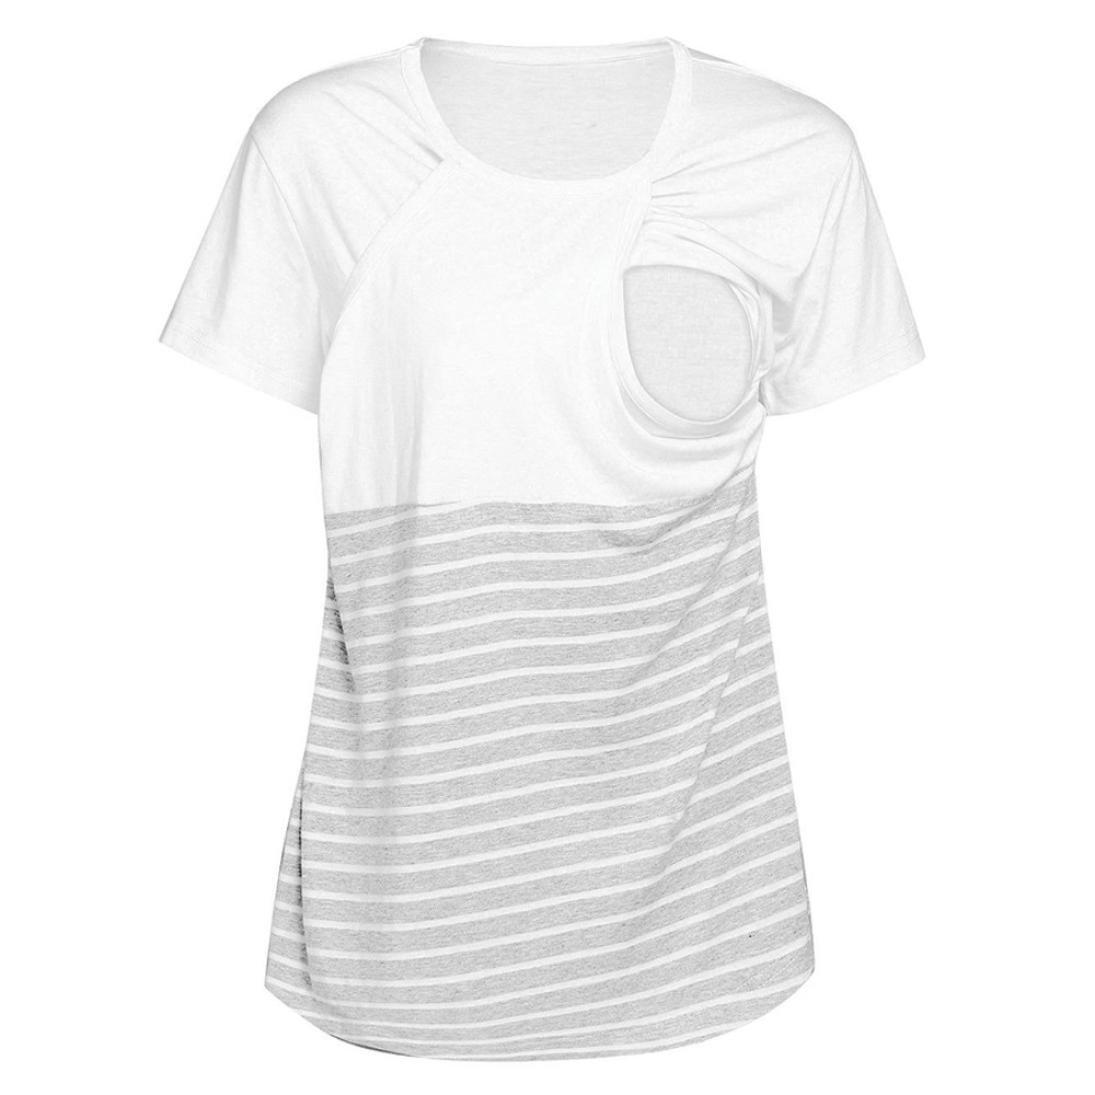 FAPIZI Clearance Women Pregnant Maternity Nursing Stripe Breastfeeding Tops T-Shirt Blouse